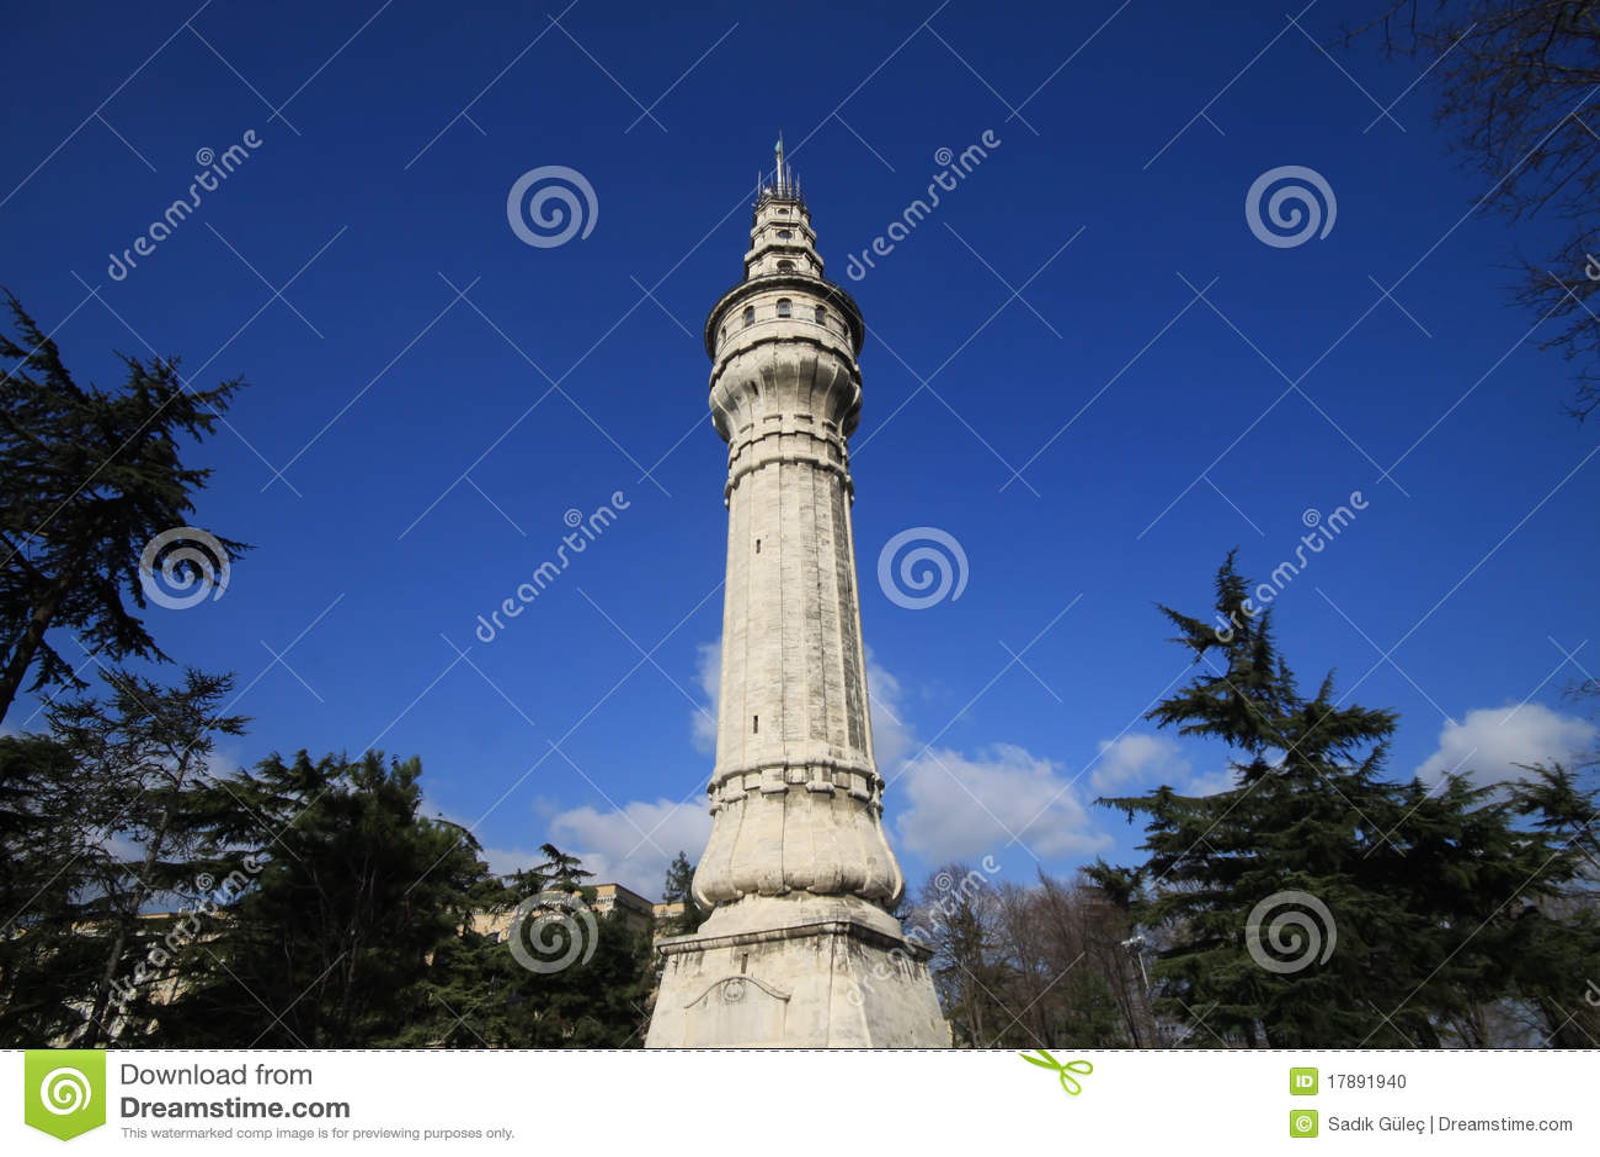 Beyazit Tower Stock Photo - Image: 17891940